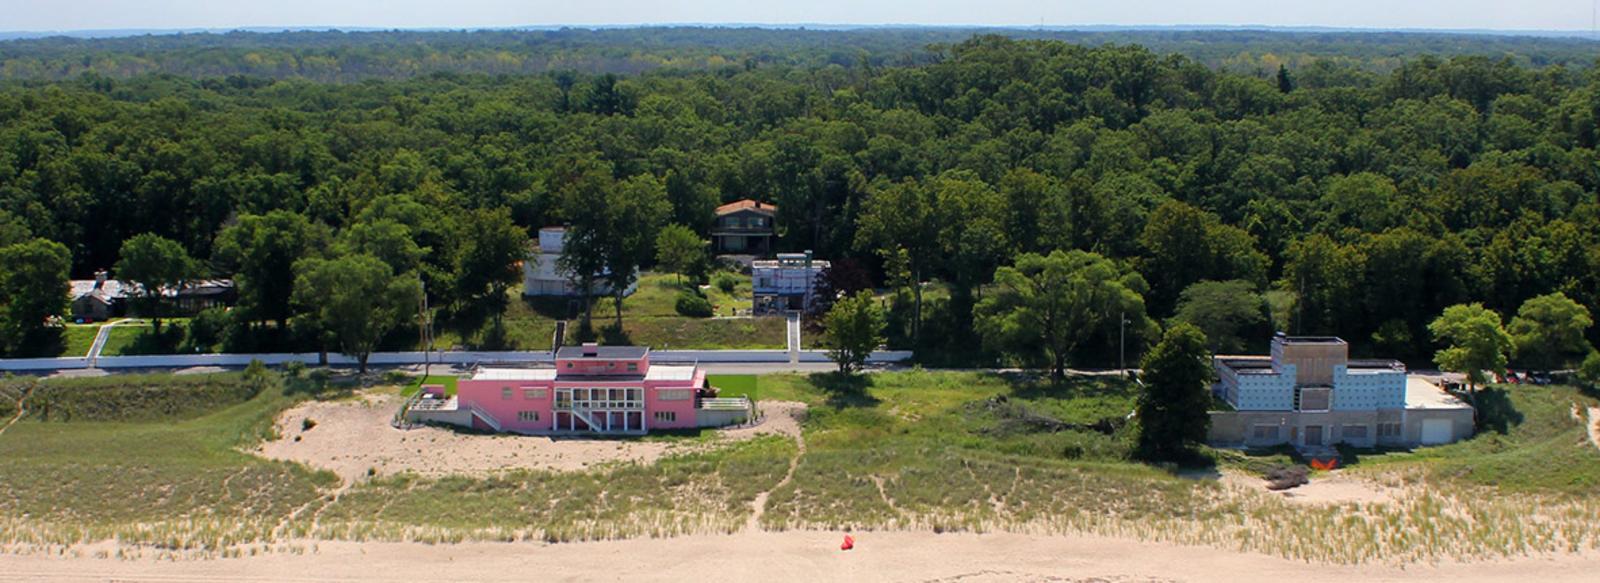 Century of Progress Homes on the beach